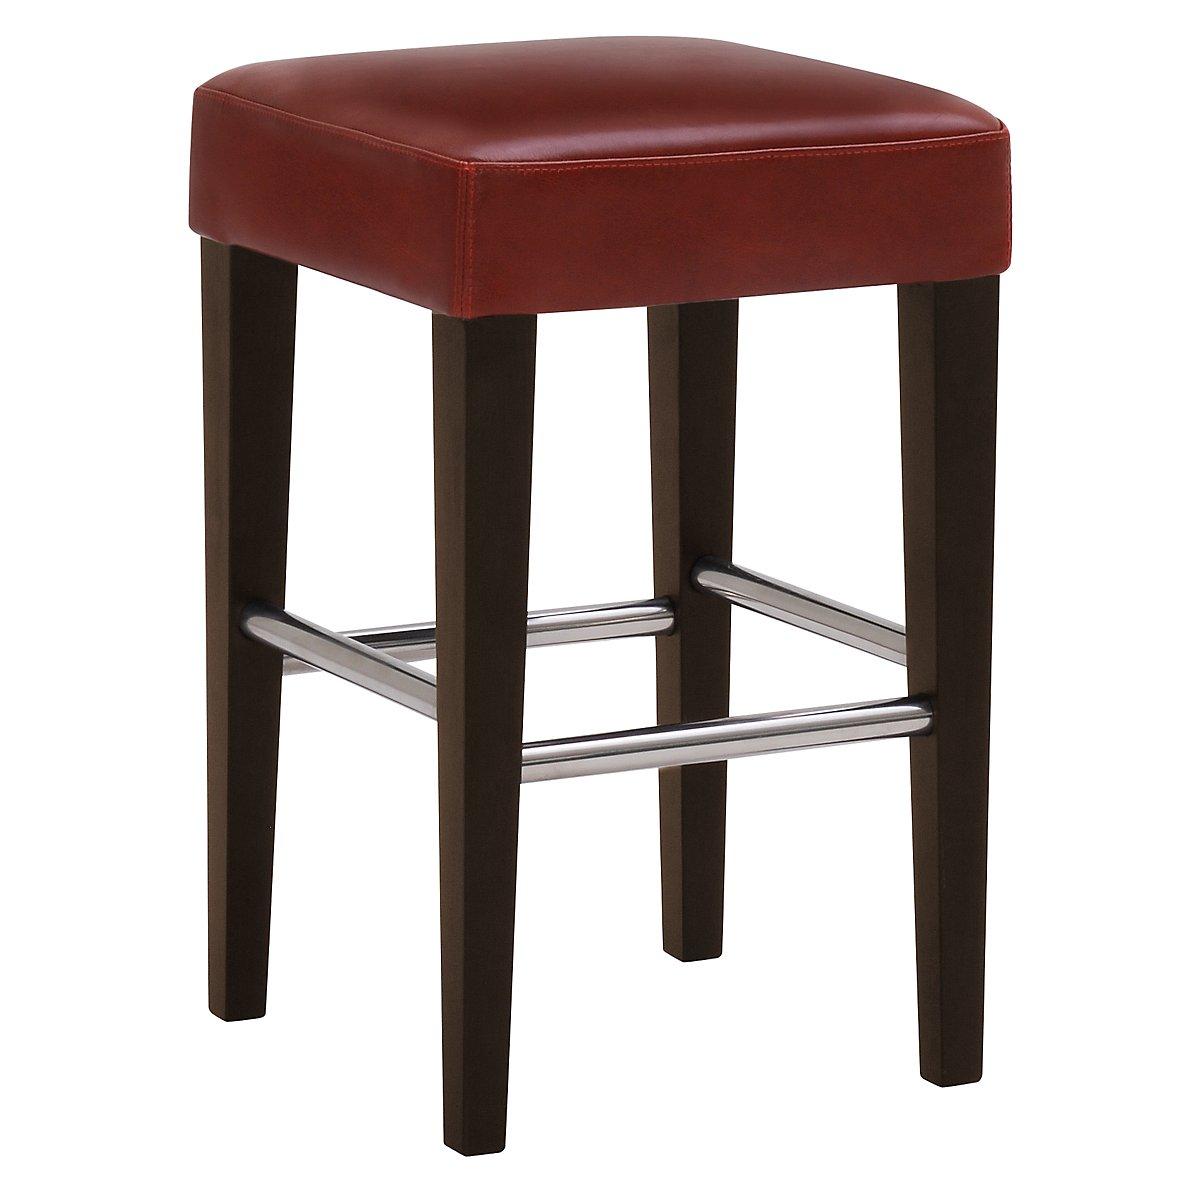 "Kayla Red 24"" Bonded Leather Barstool"